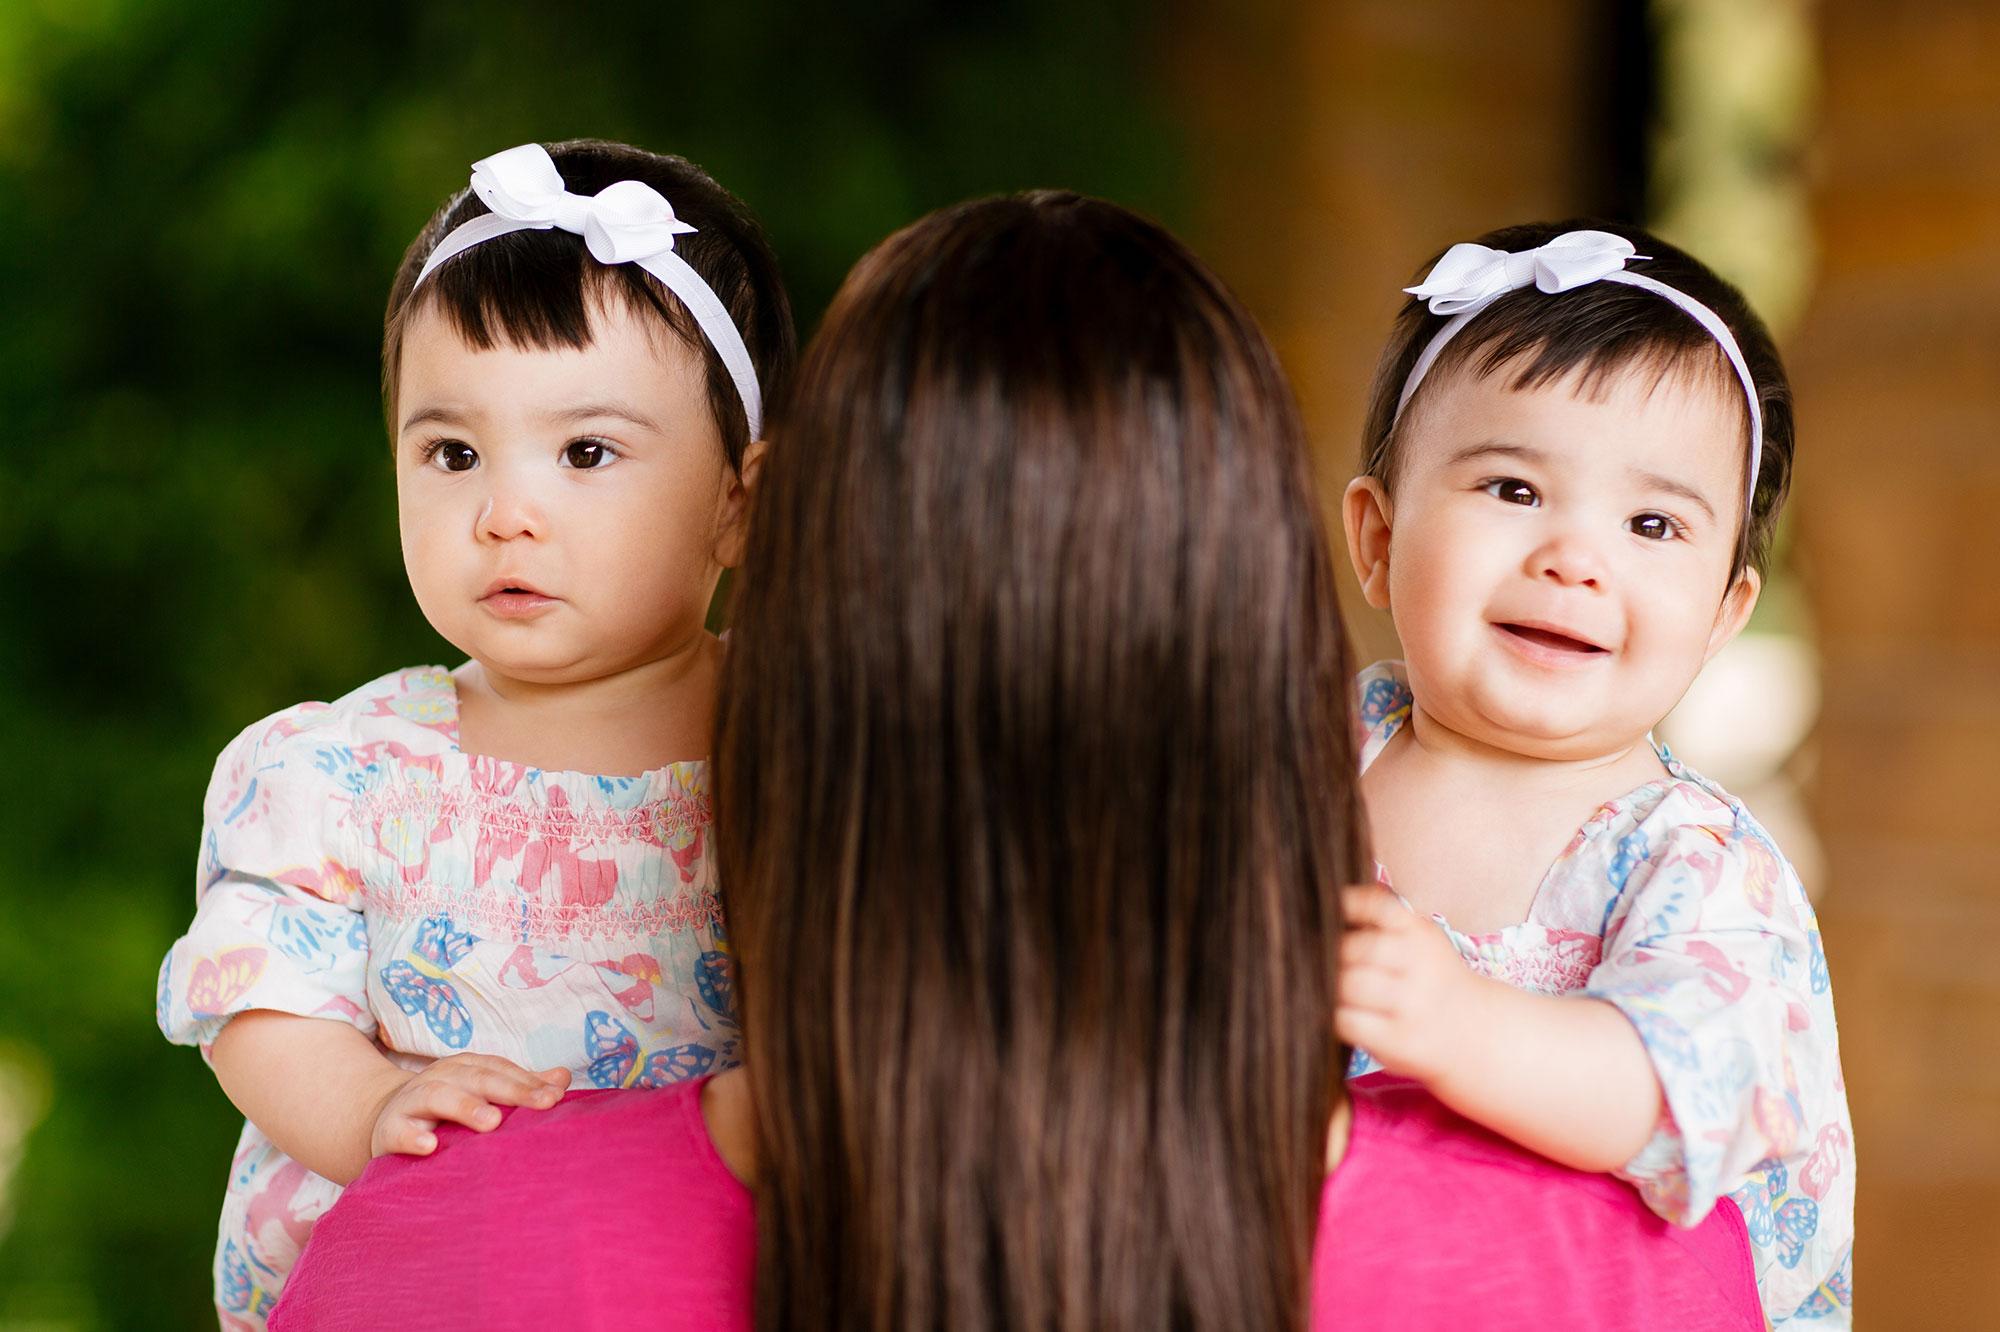 madre-con-gemelas.jpg